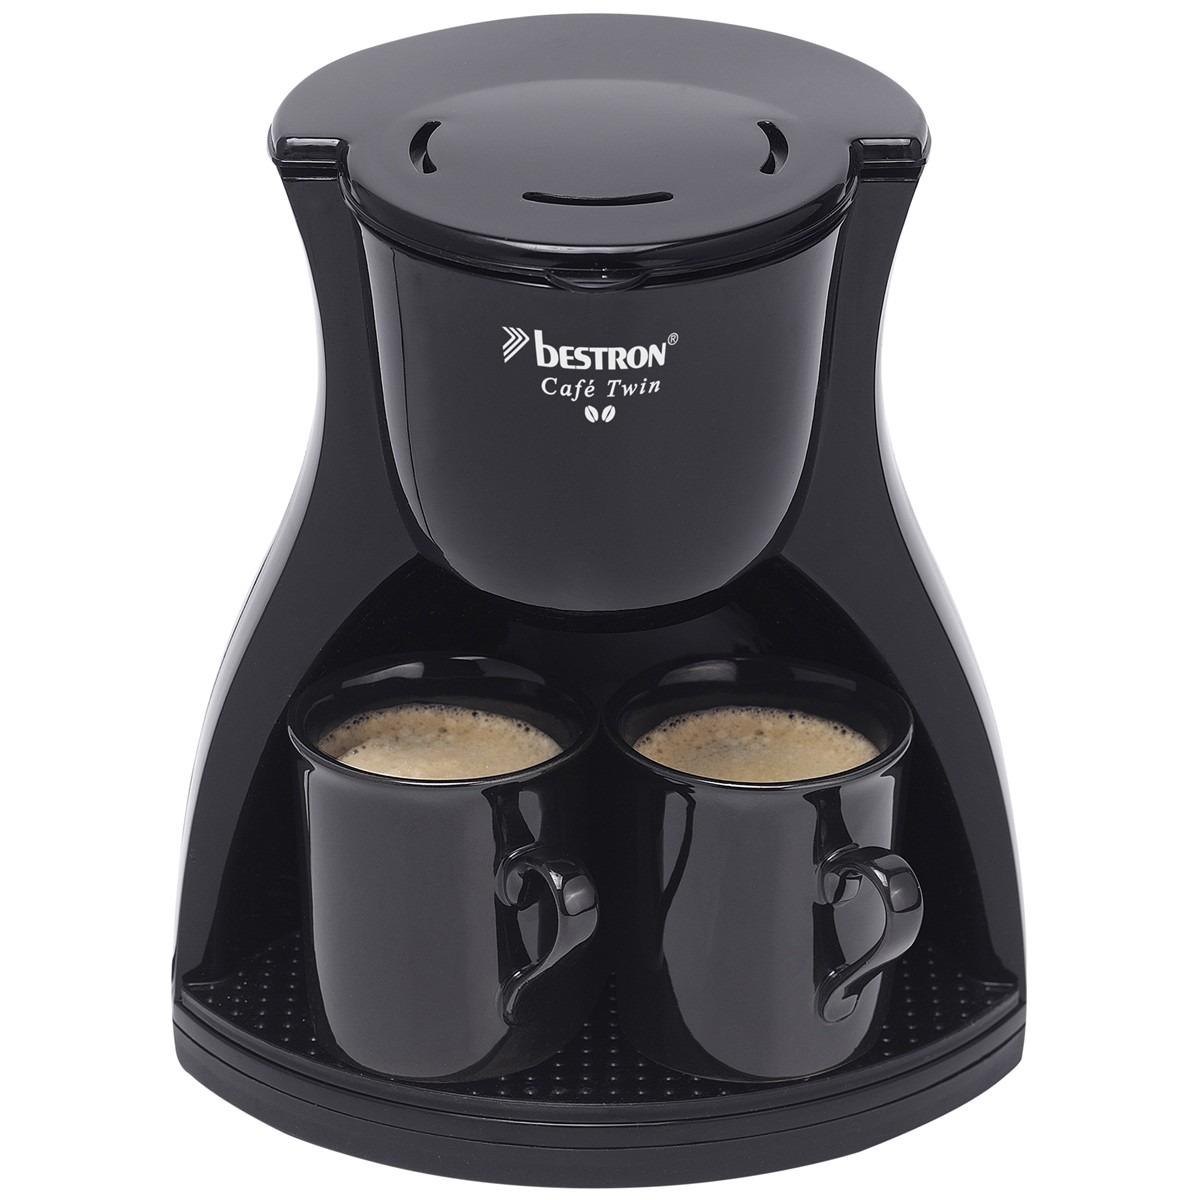 Bestron koffiefilter apparaat ACM8007BE